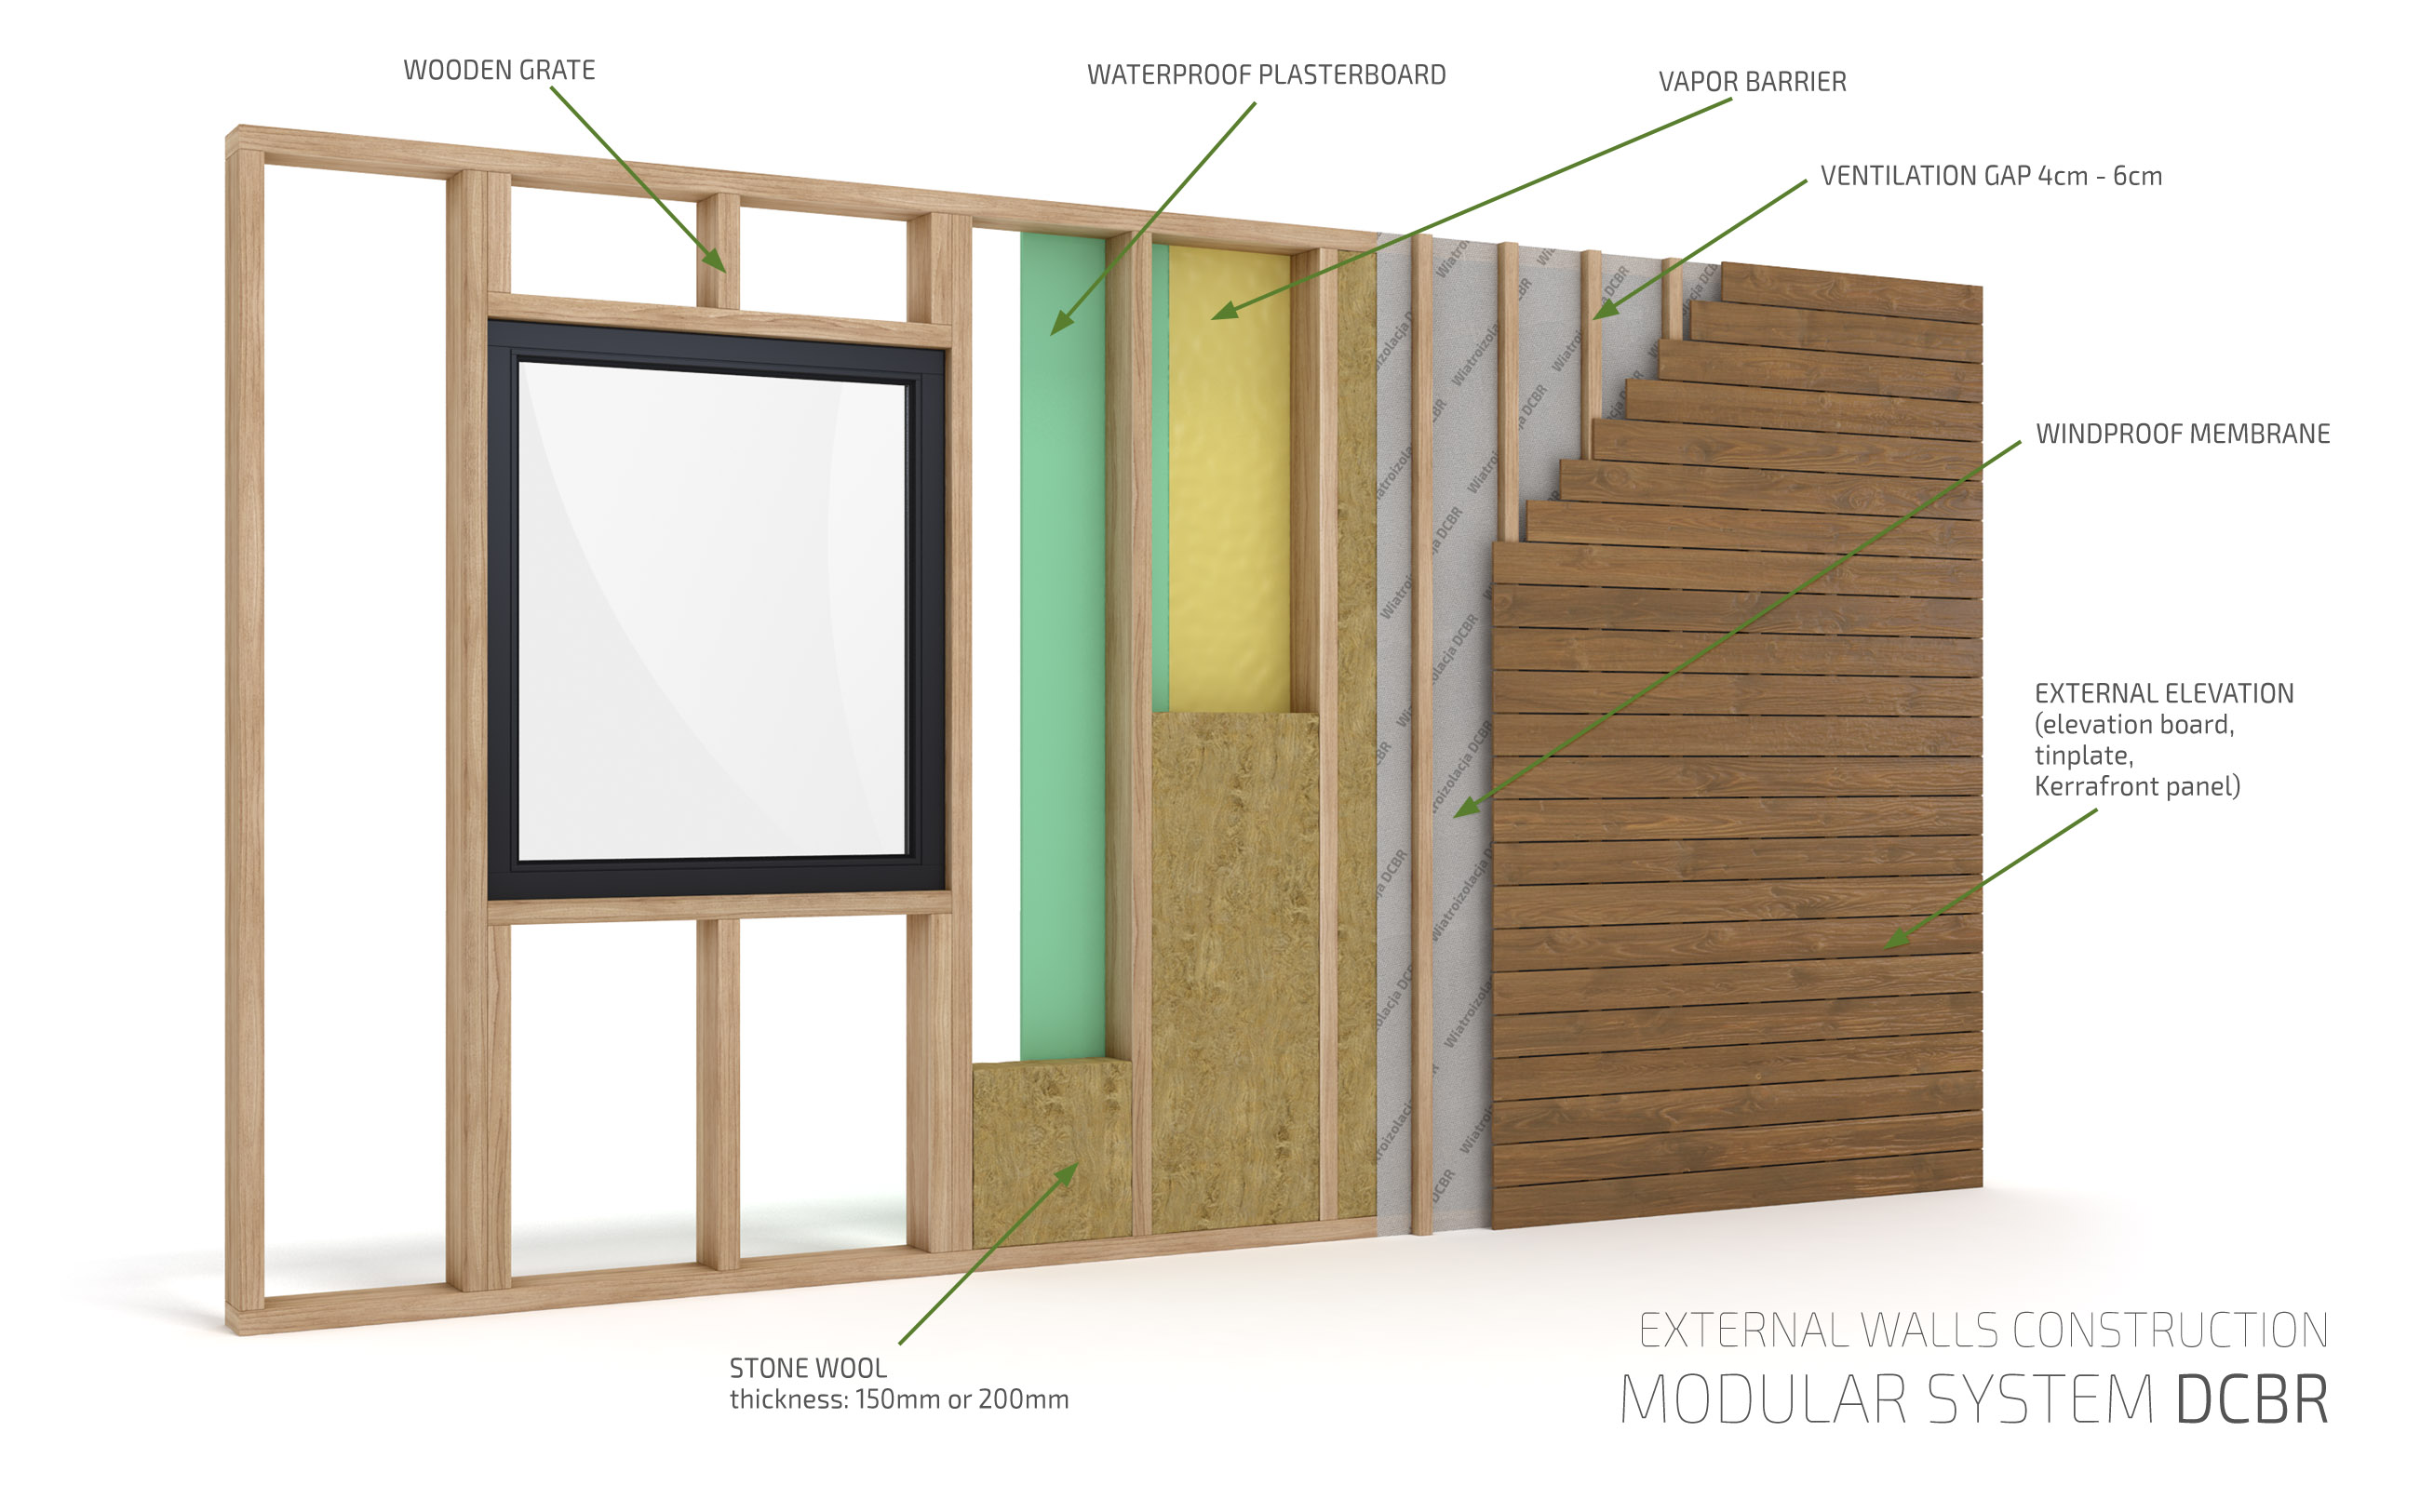 EXTERNAL WALLS CONSTRUCTION MODULAR SYSTEM DCBR